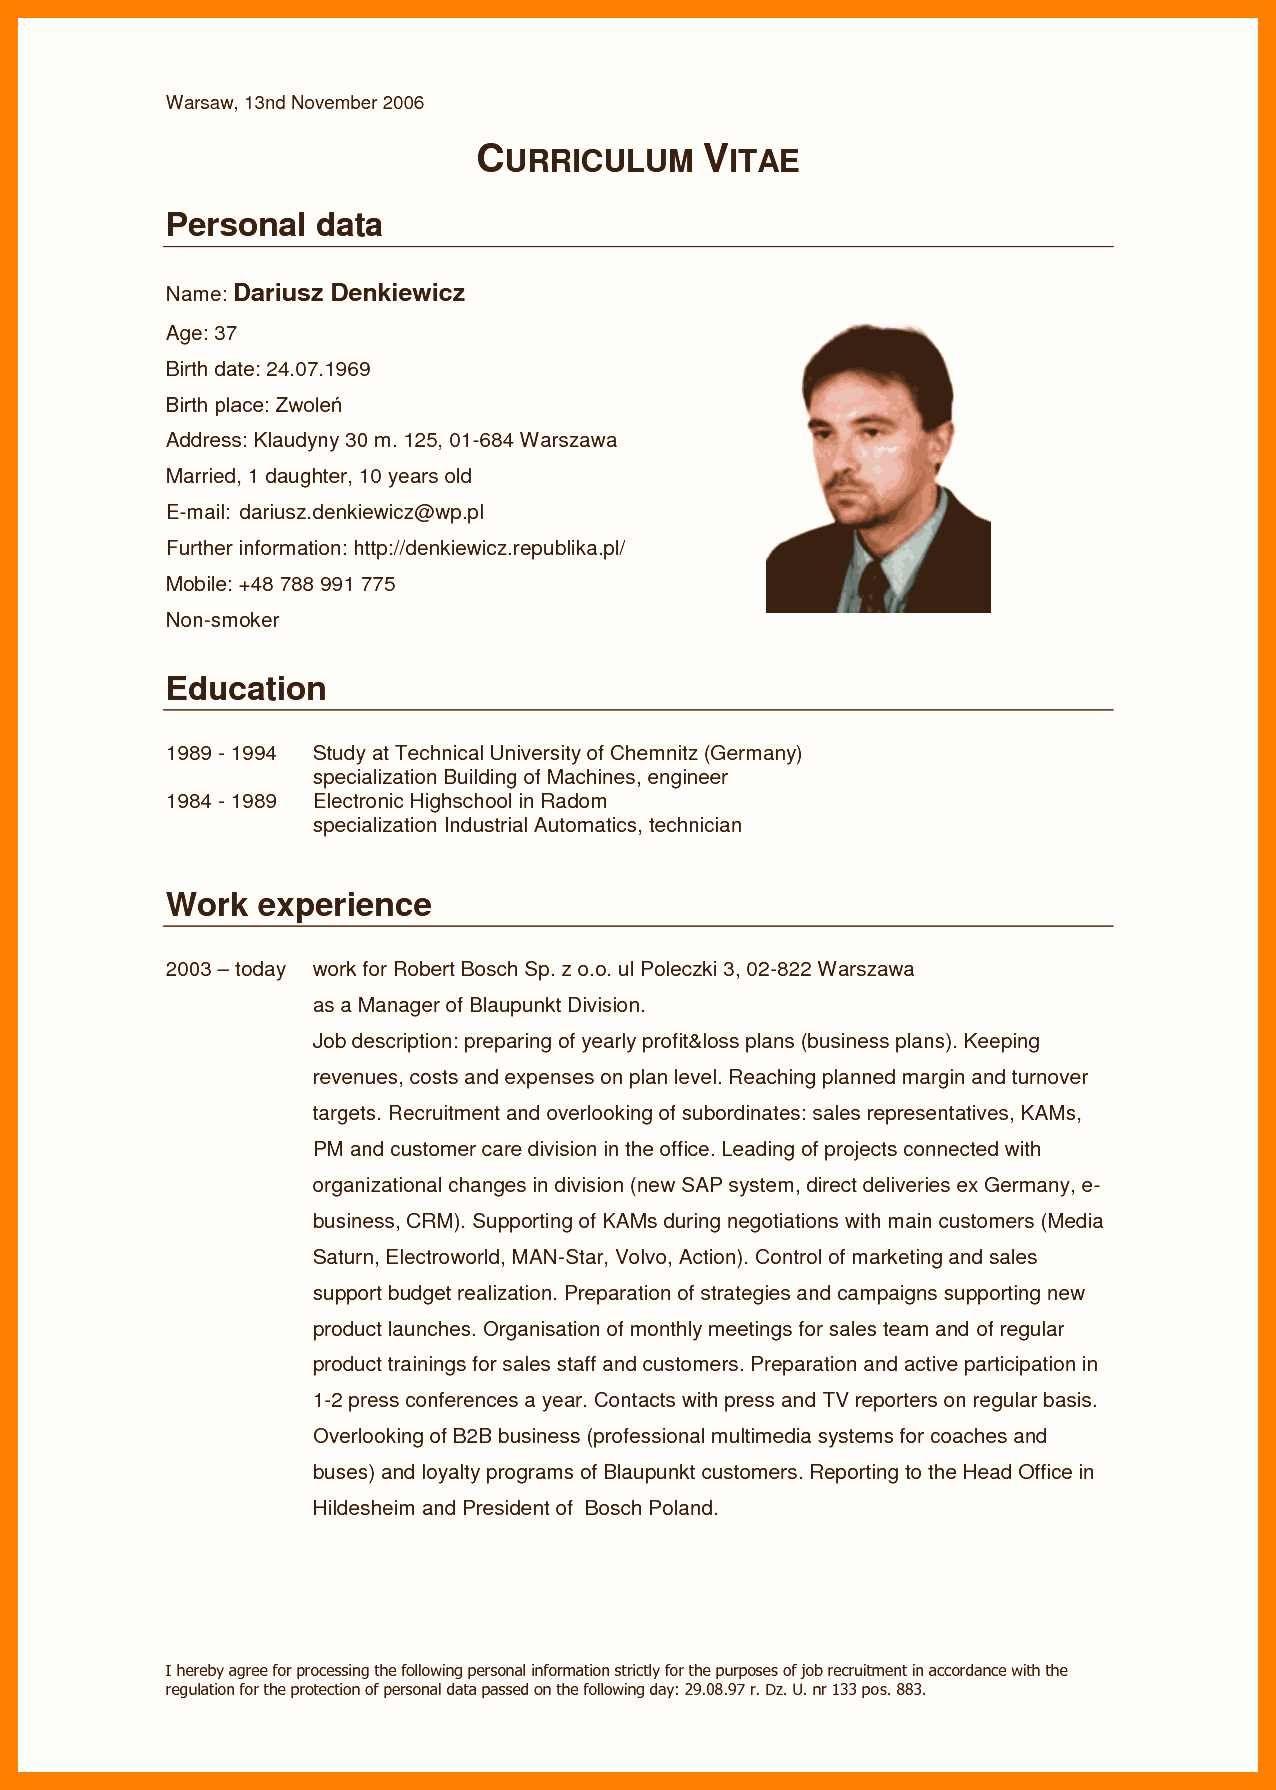 Resume Format Germany Resume format, Resume, Biodata